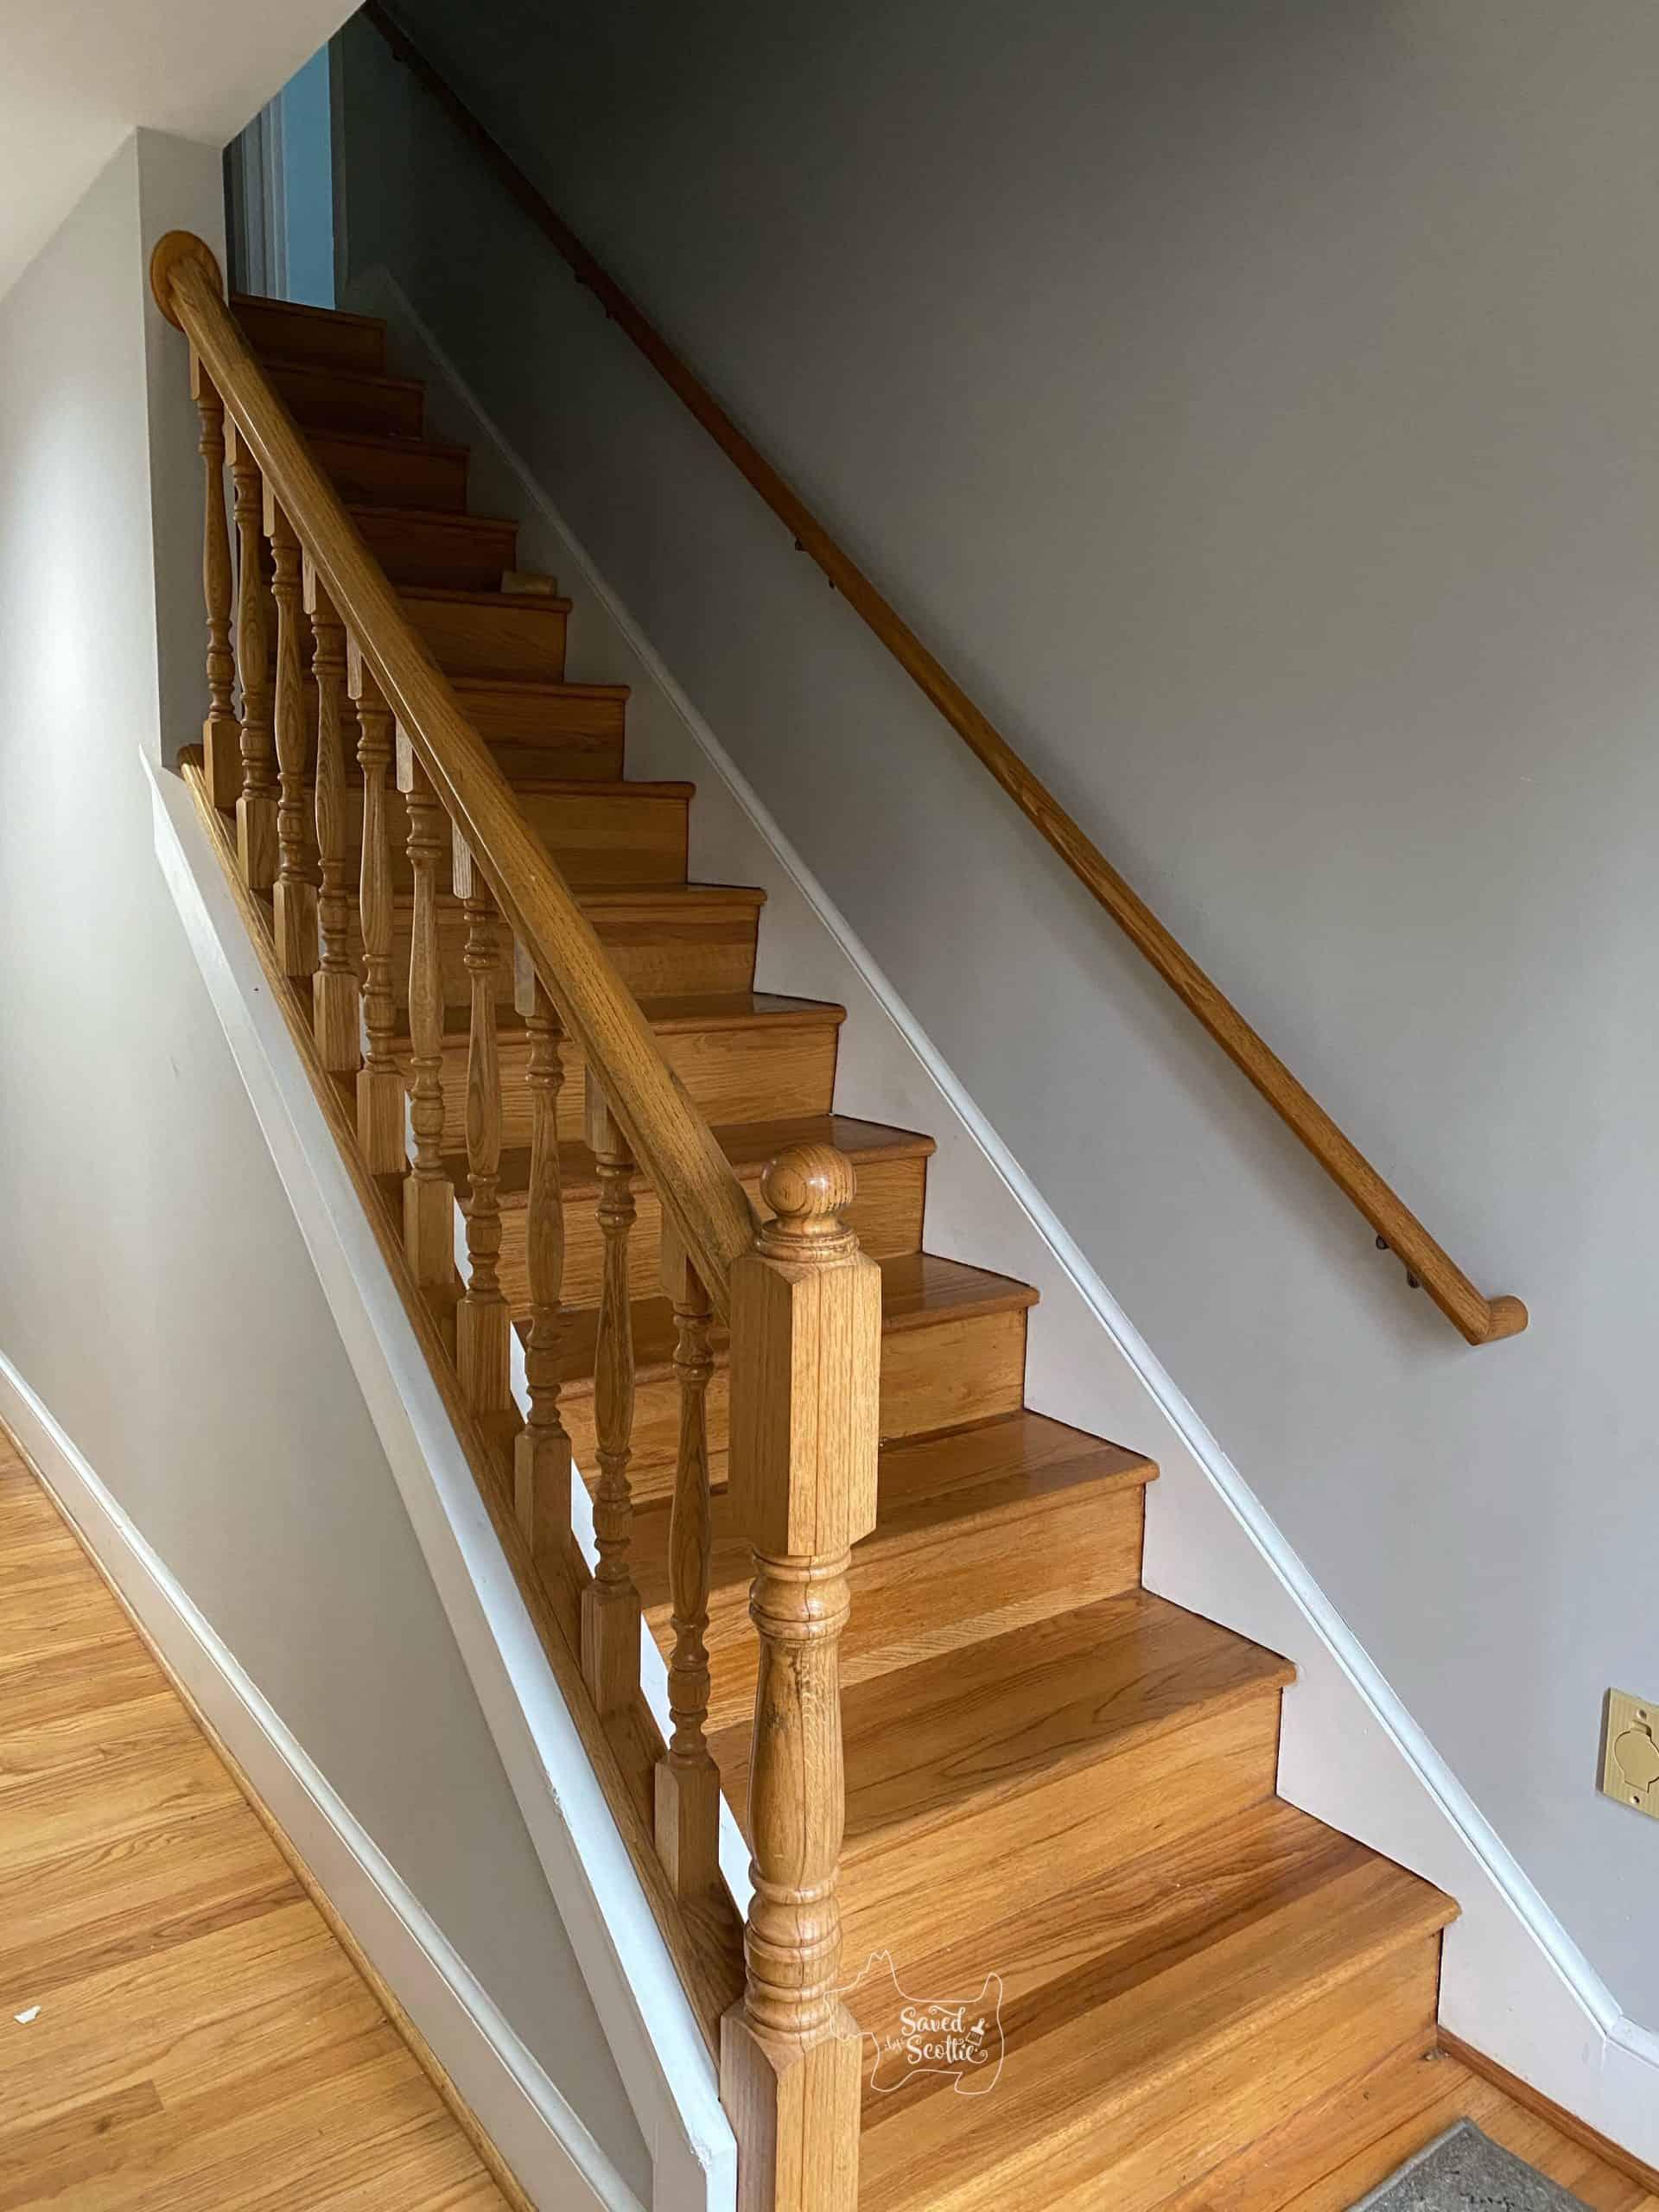 Painted Stair Railings - Saved by Scottie